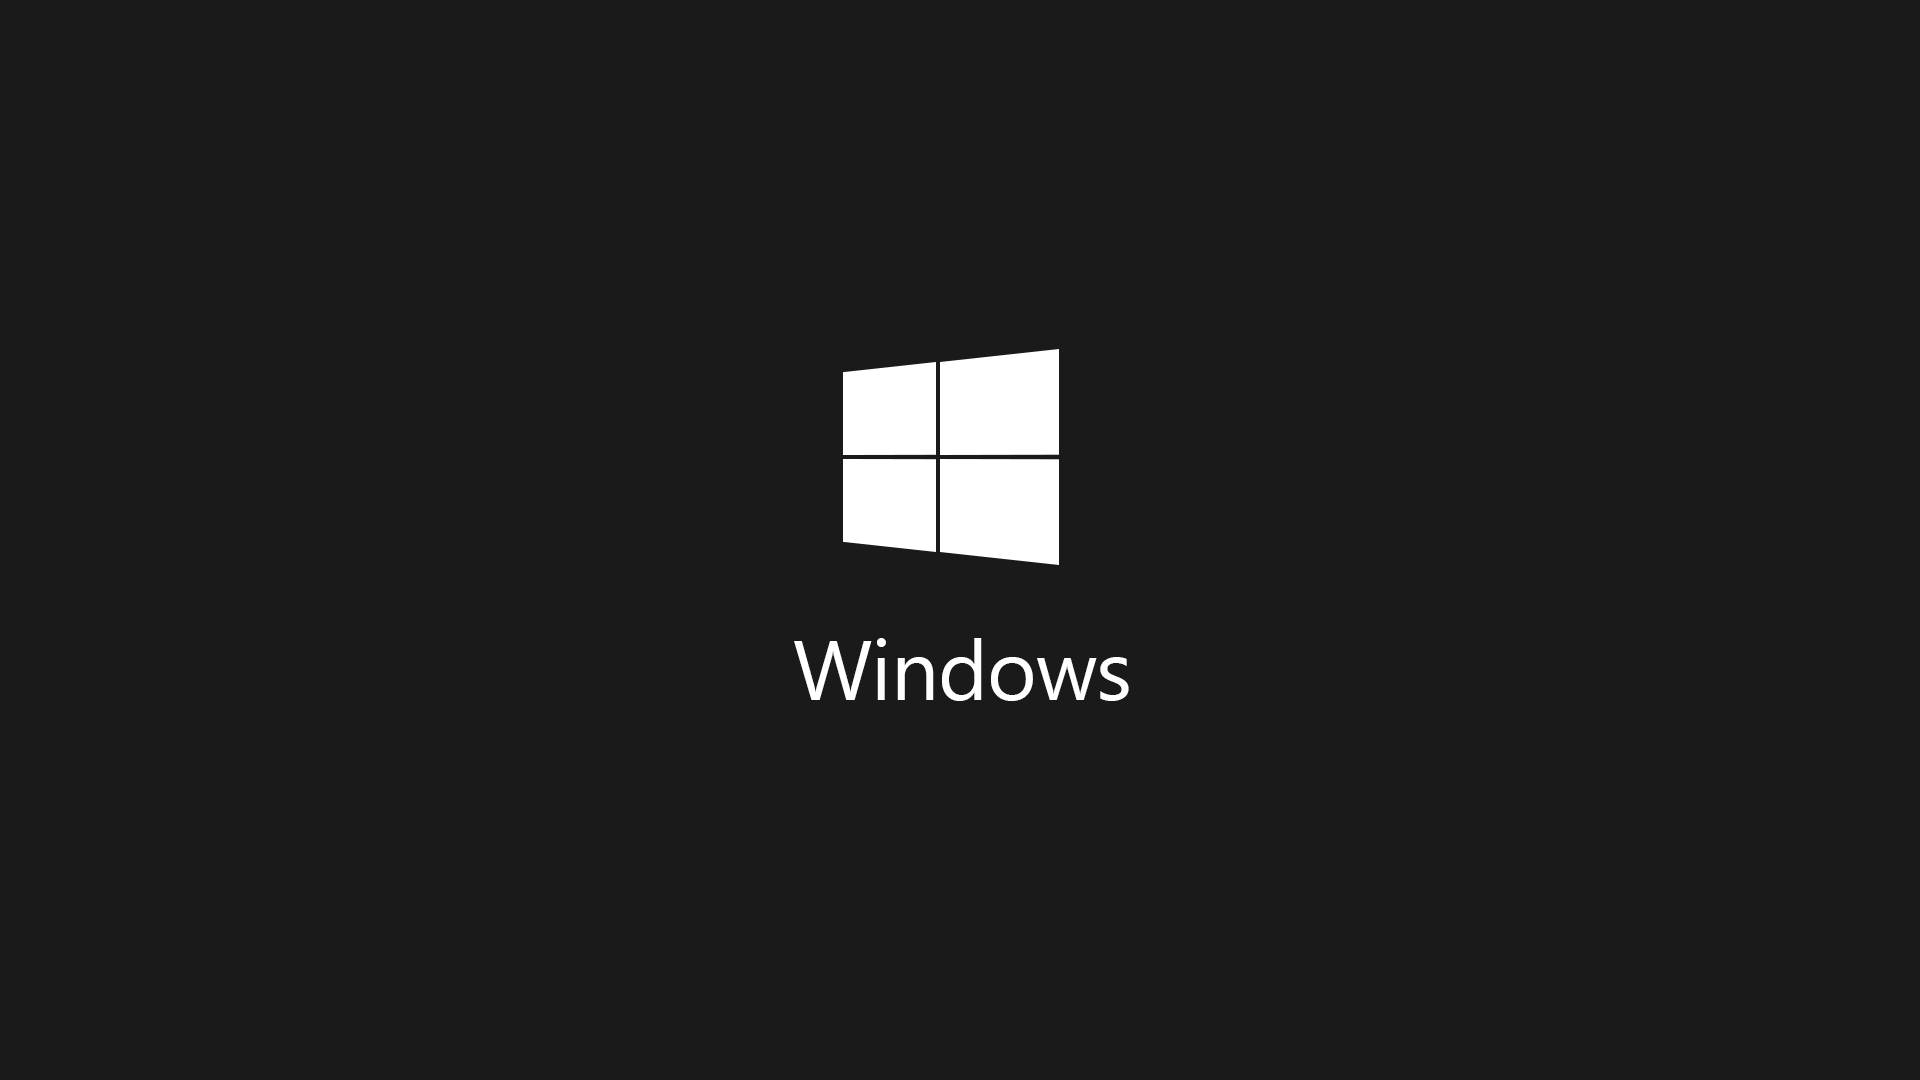 Windows Dark, HD Computer, 4k Wallpapers, Images ...